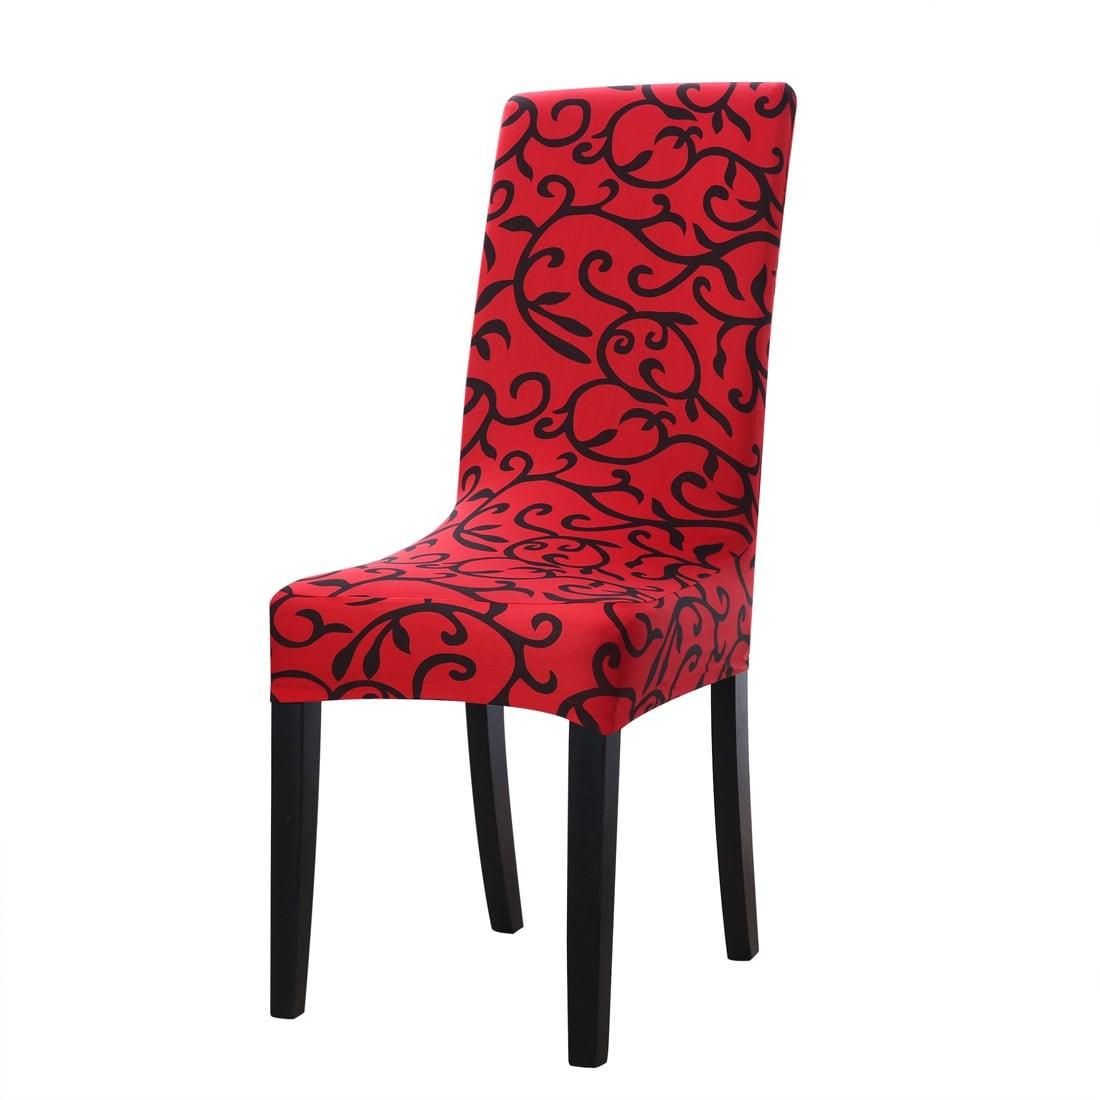 2pcs Elastic Short-back Chair Seat Covers Bar Stool Slipcovers Protector